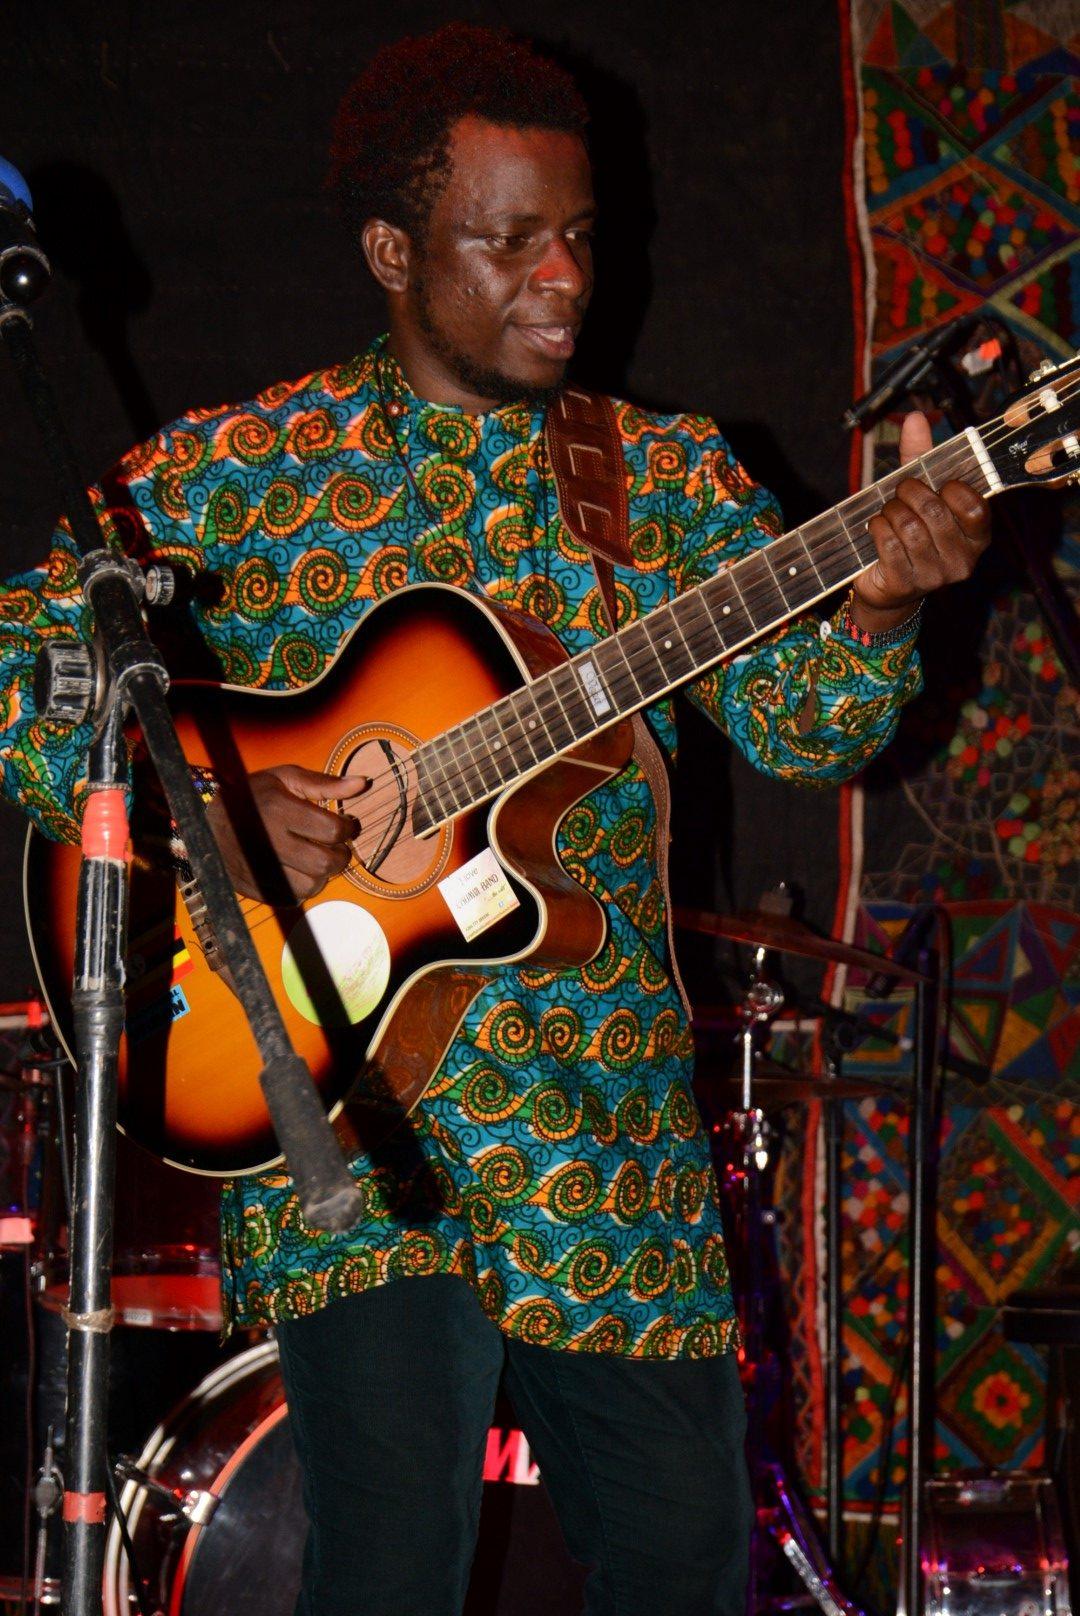 Giovani Kiyingi